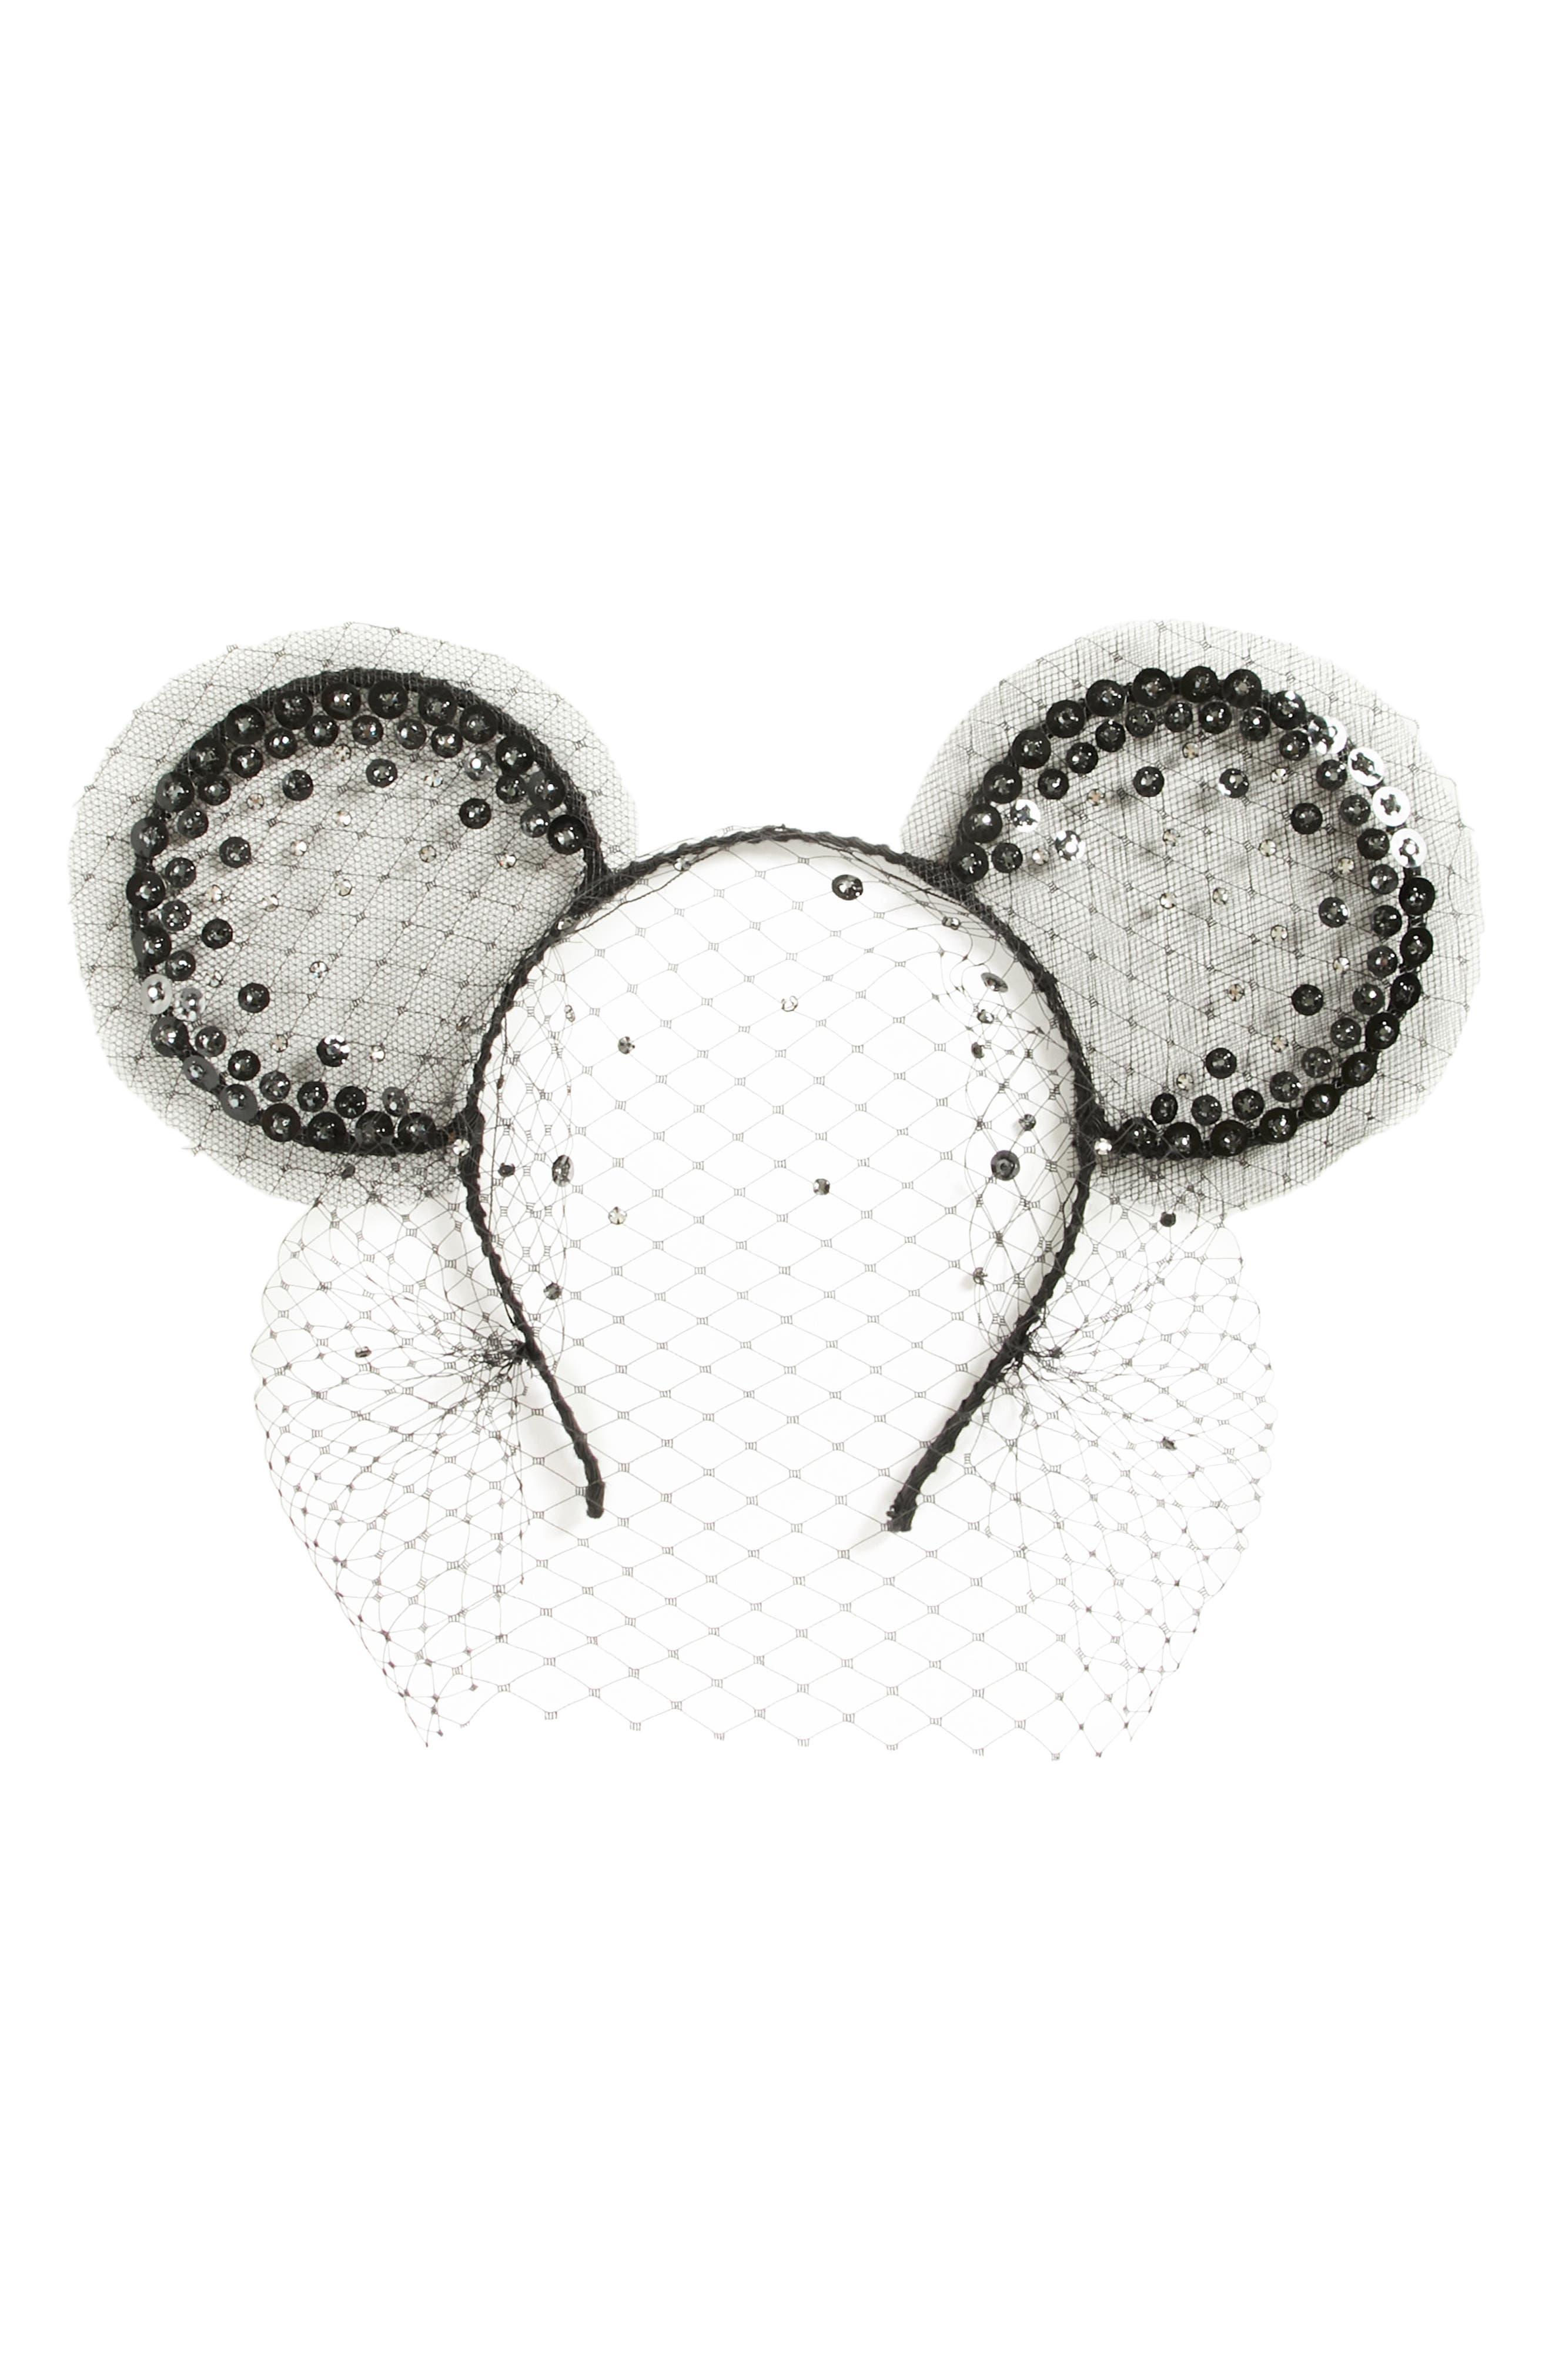 x Disney Mickey Magic Moment Midnight Veil  Headband,                         Main,                         color, BLACK